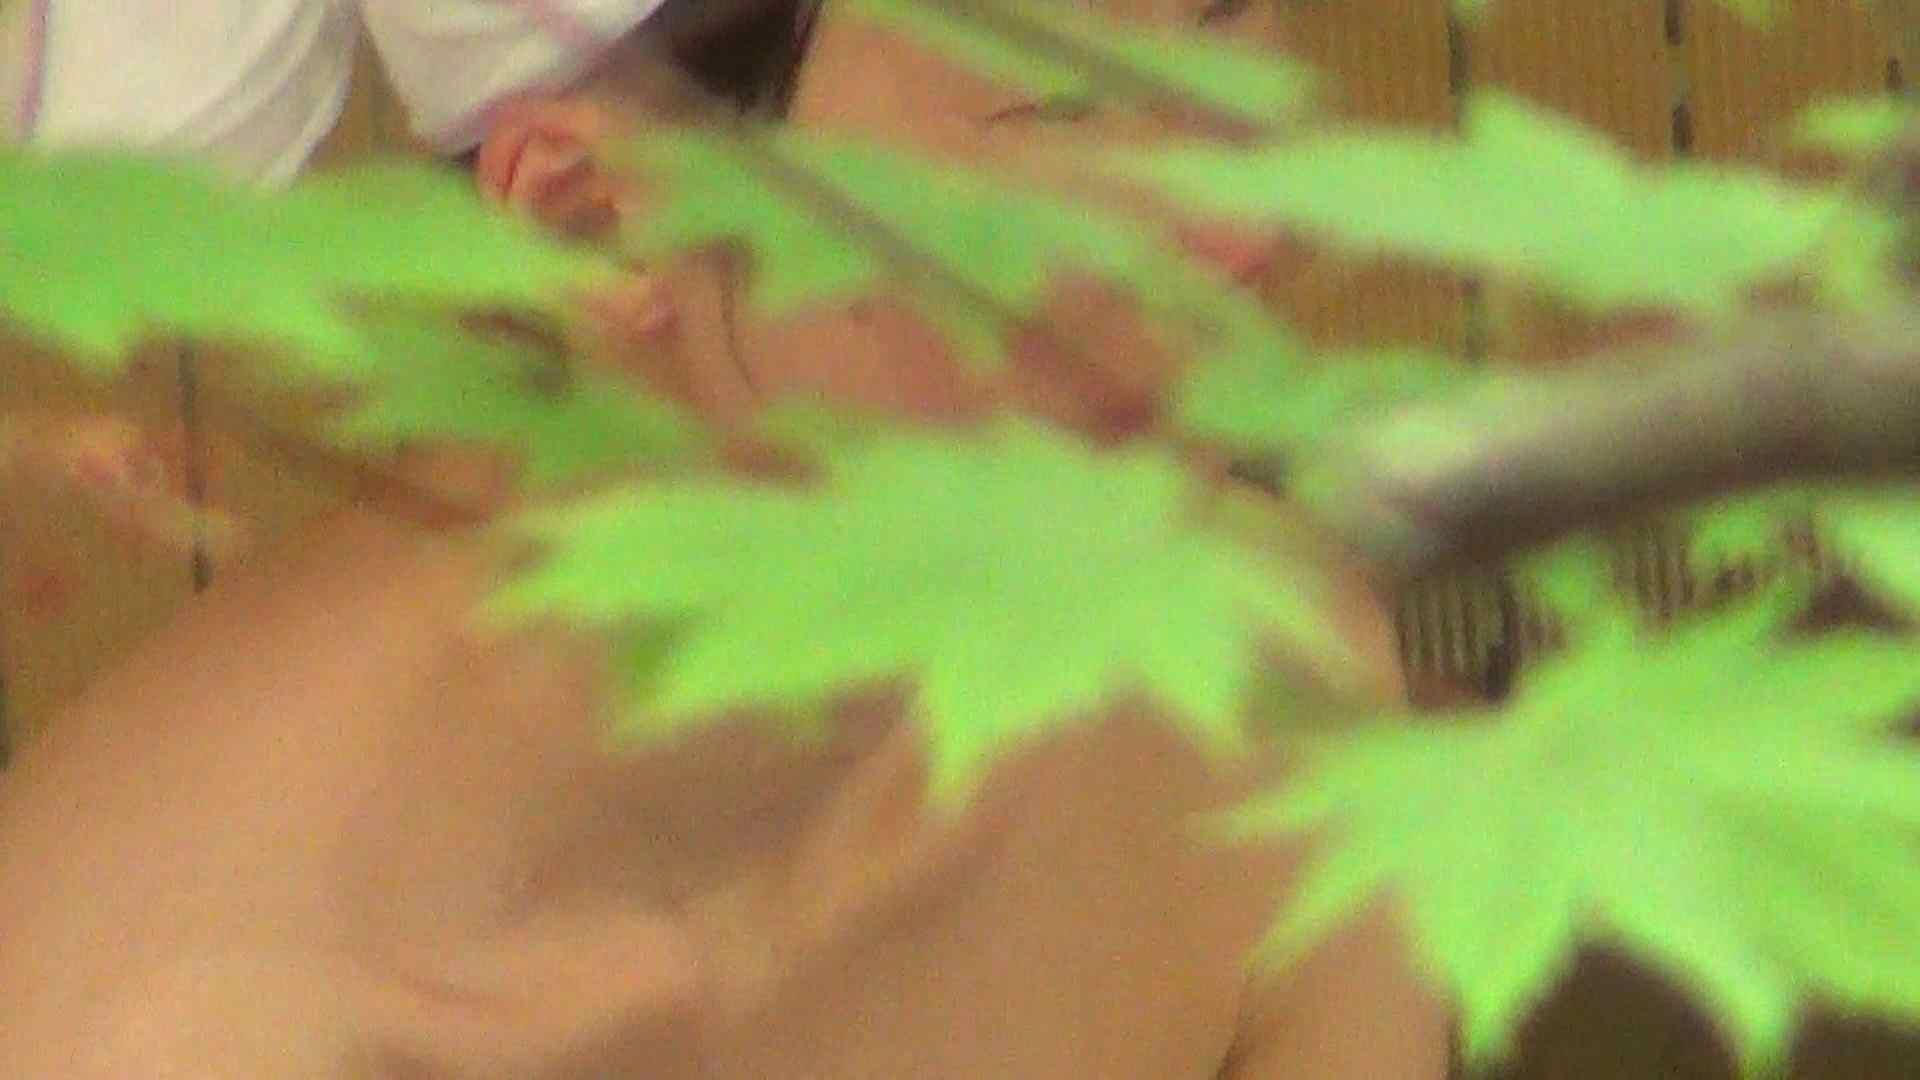 Aquaな露天風呂Vol.247 露天風呂編 | 盗撮シリーズ  87PIX 5